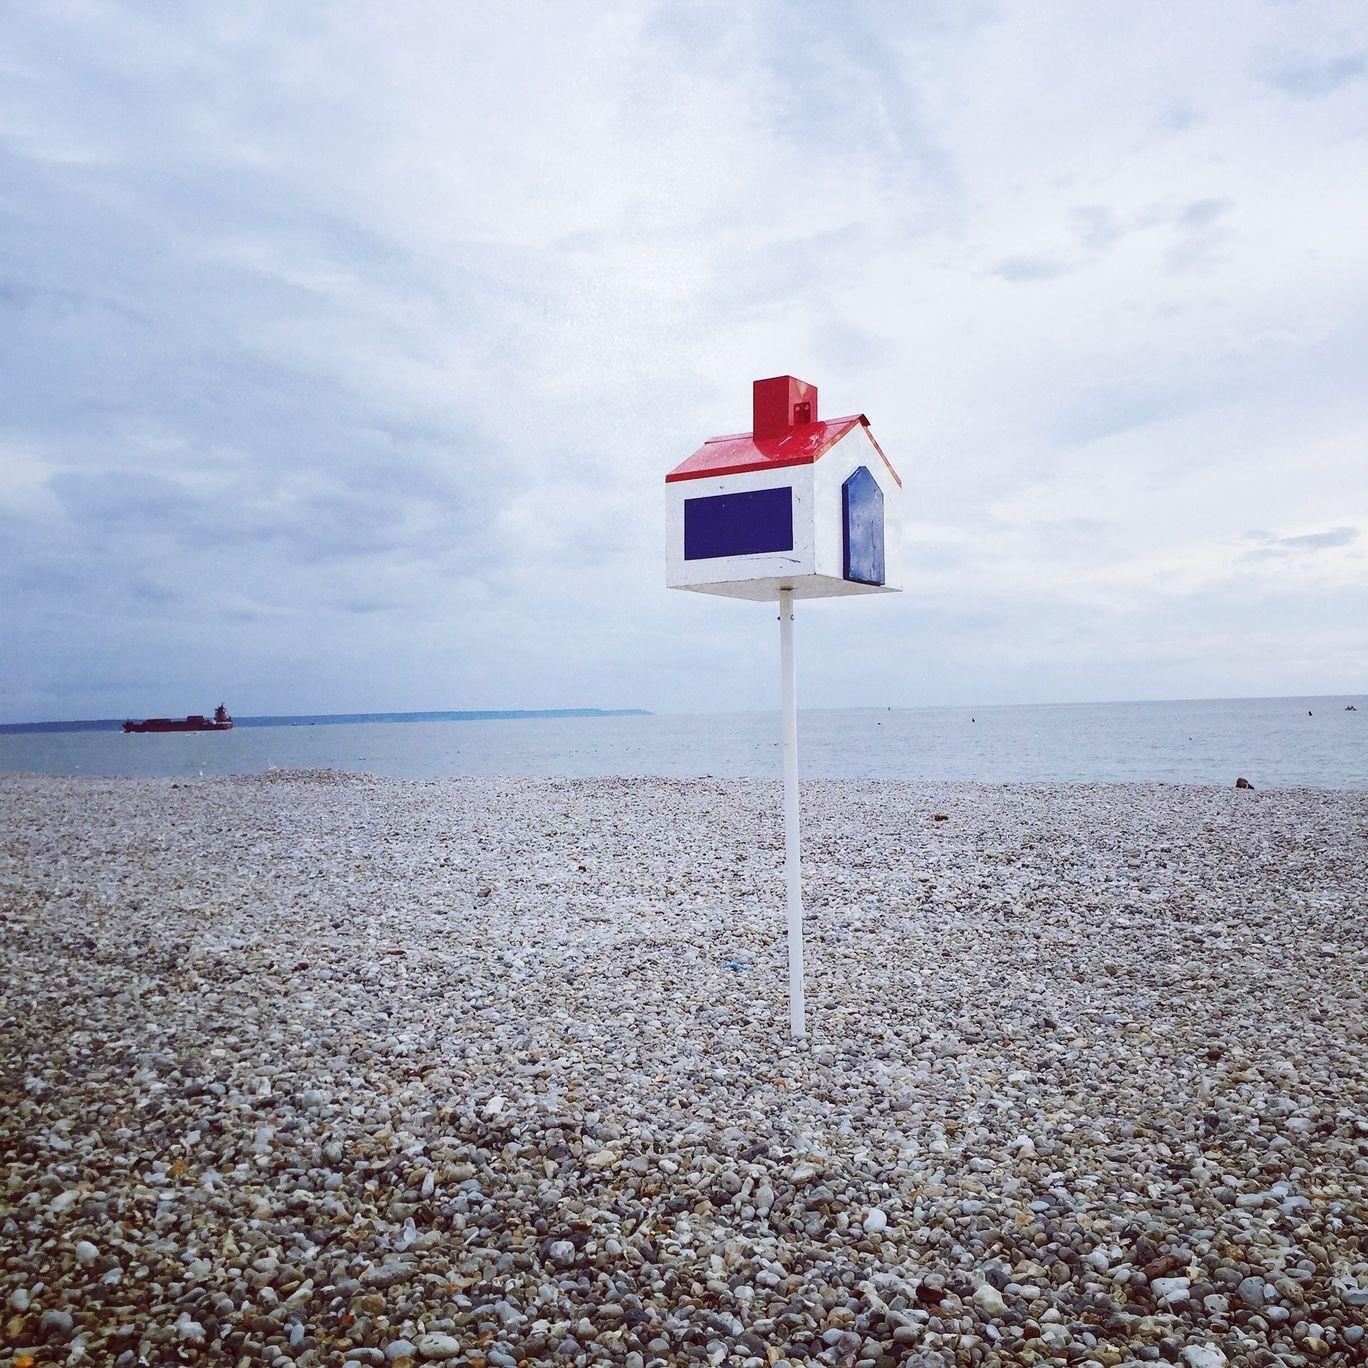 Photo of Le Havre By Varun Mahipal